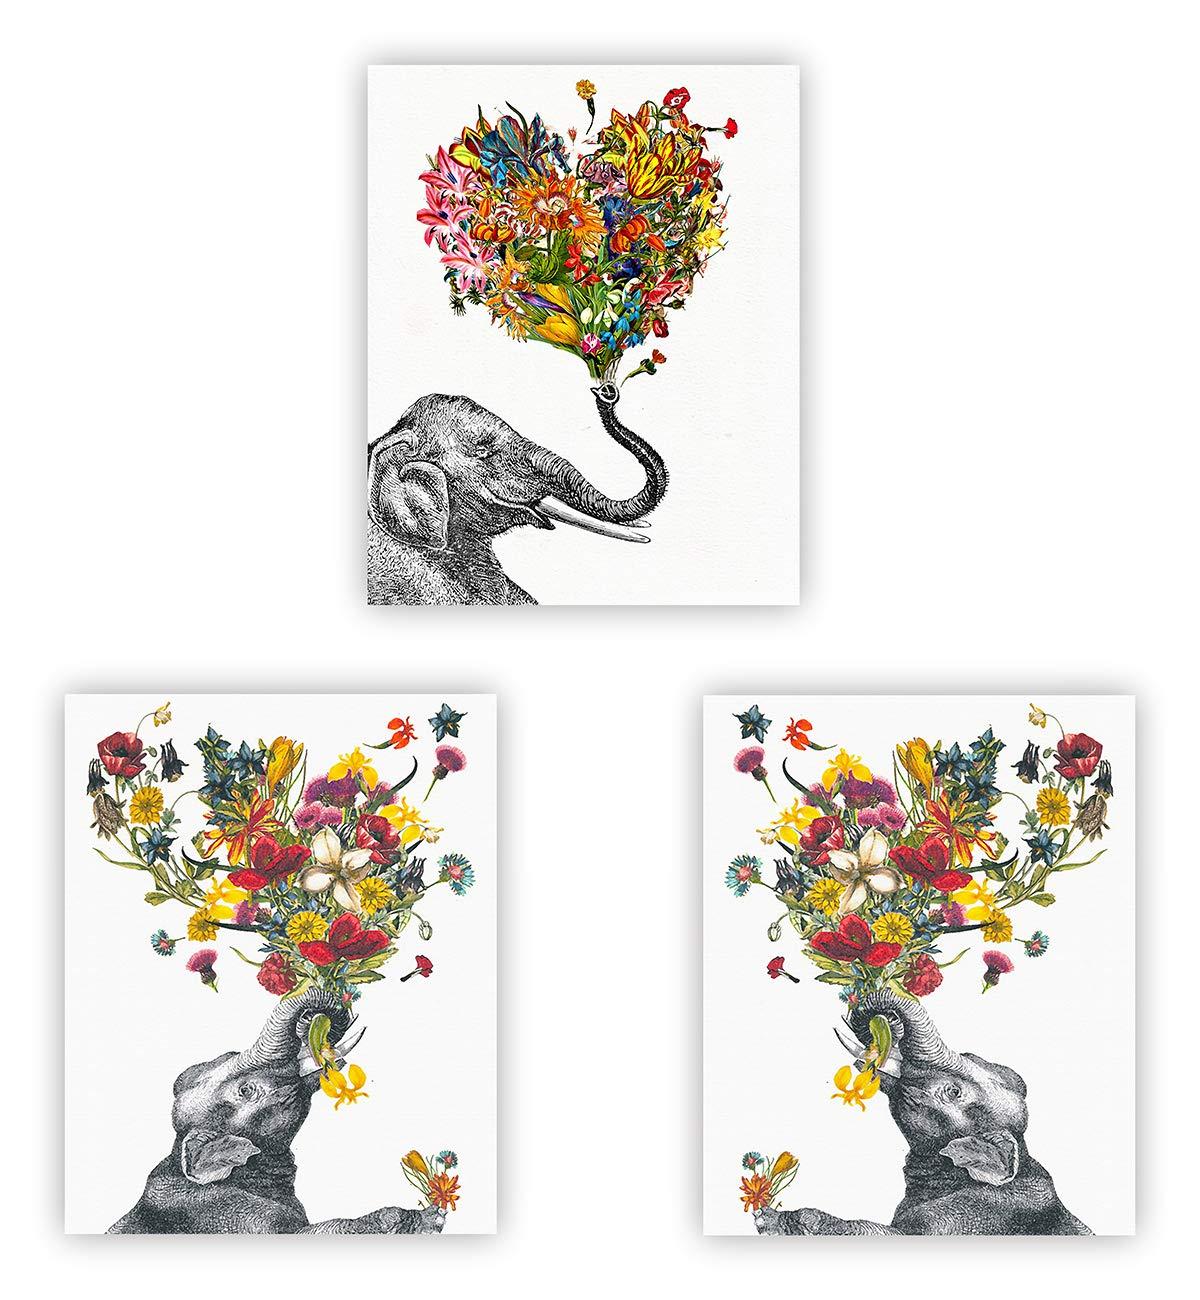 Barri Design Elephant Prints Flowers Print Cute Elephant Flower Wall Art Glitter Watercolor Elephant Wall Decor Set of 3 Elephant Decor Living Room Home Decor (UNFRAMED)